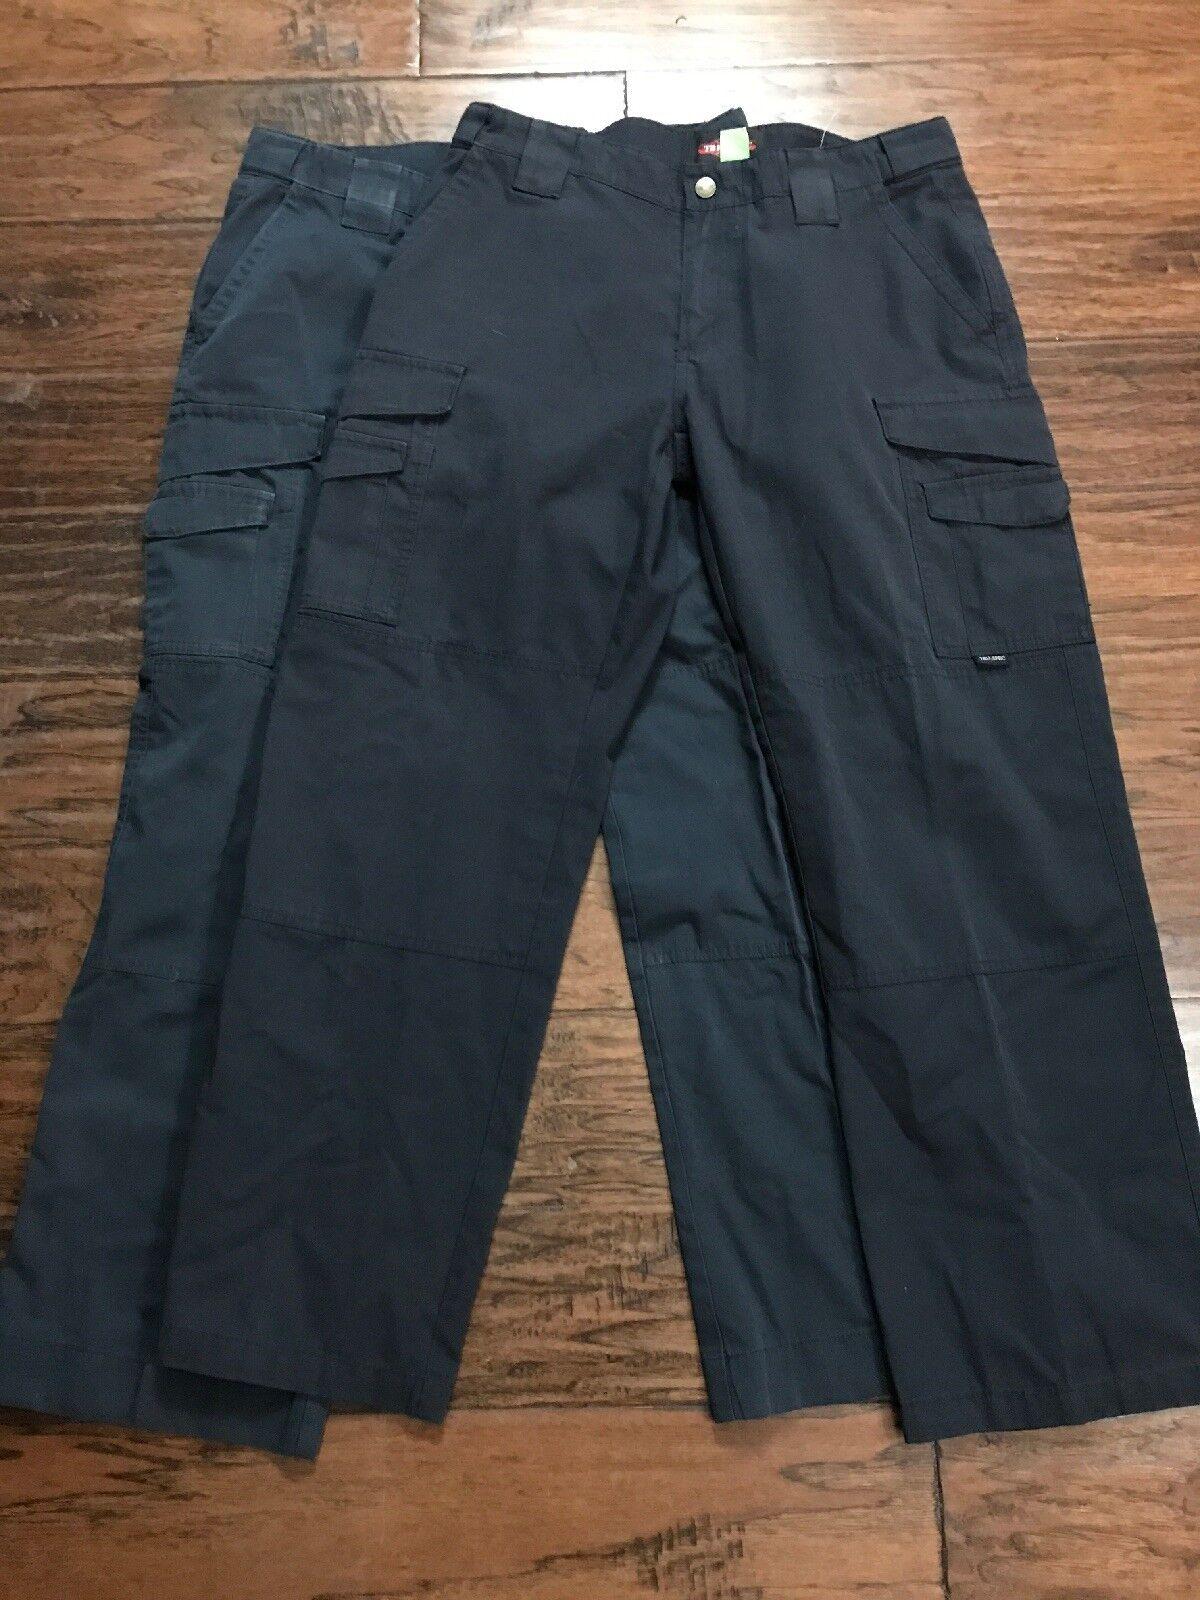 2 Pair Of Womens Tru-spec bluee Tactical Cargo Pants Size 8 Inseam 29 (w34)